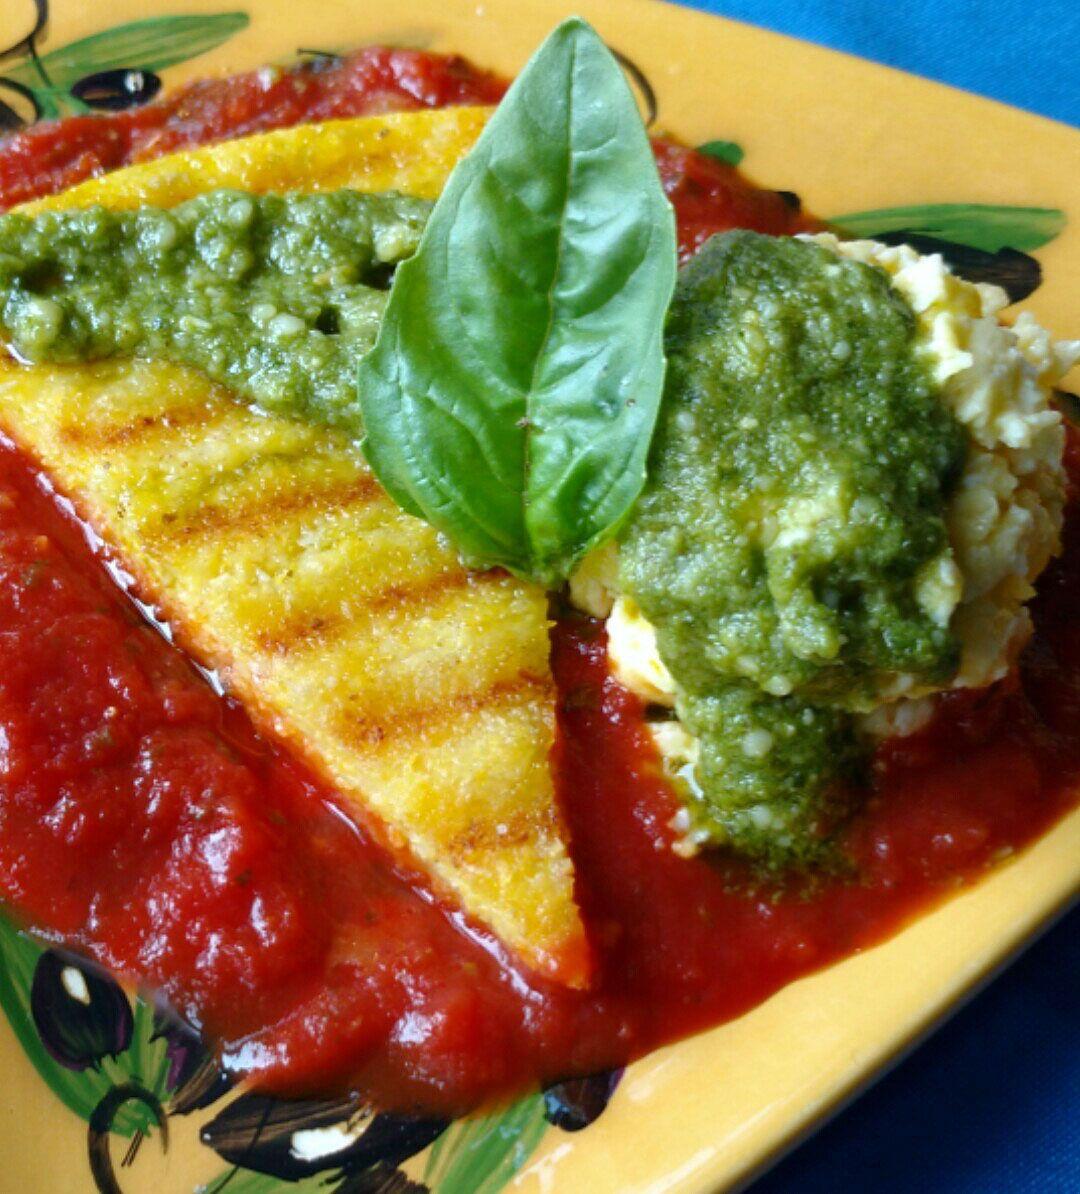 Ham And Avocado Scramble Recipe: Beazley House Grilled Polenta With Cheesy Egg Scramble